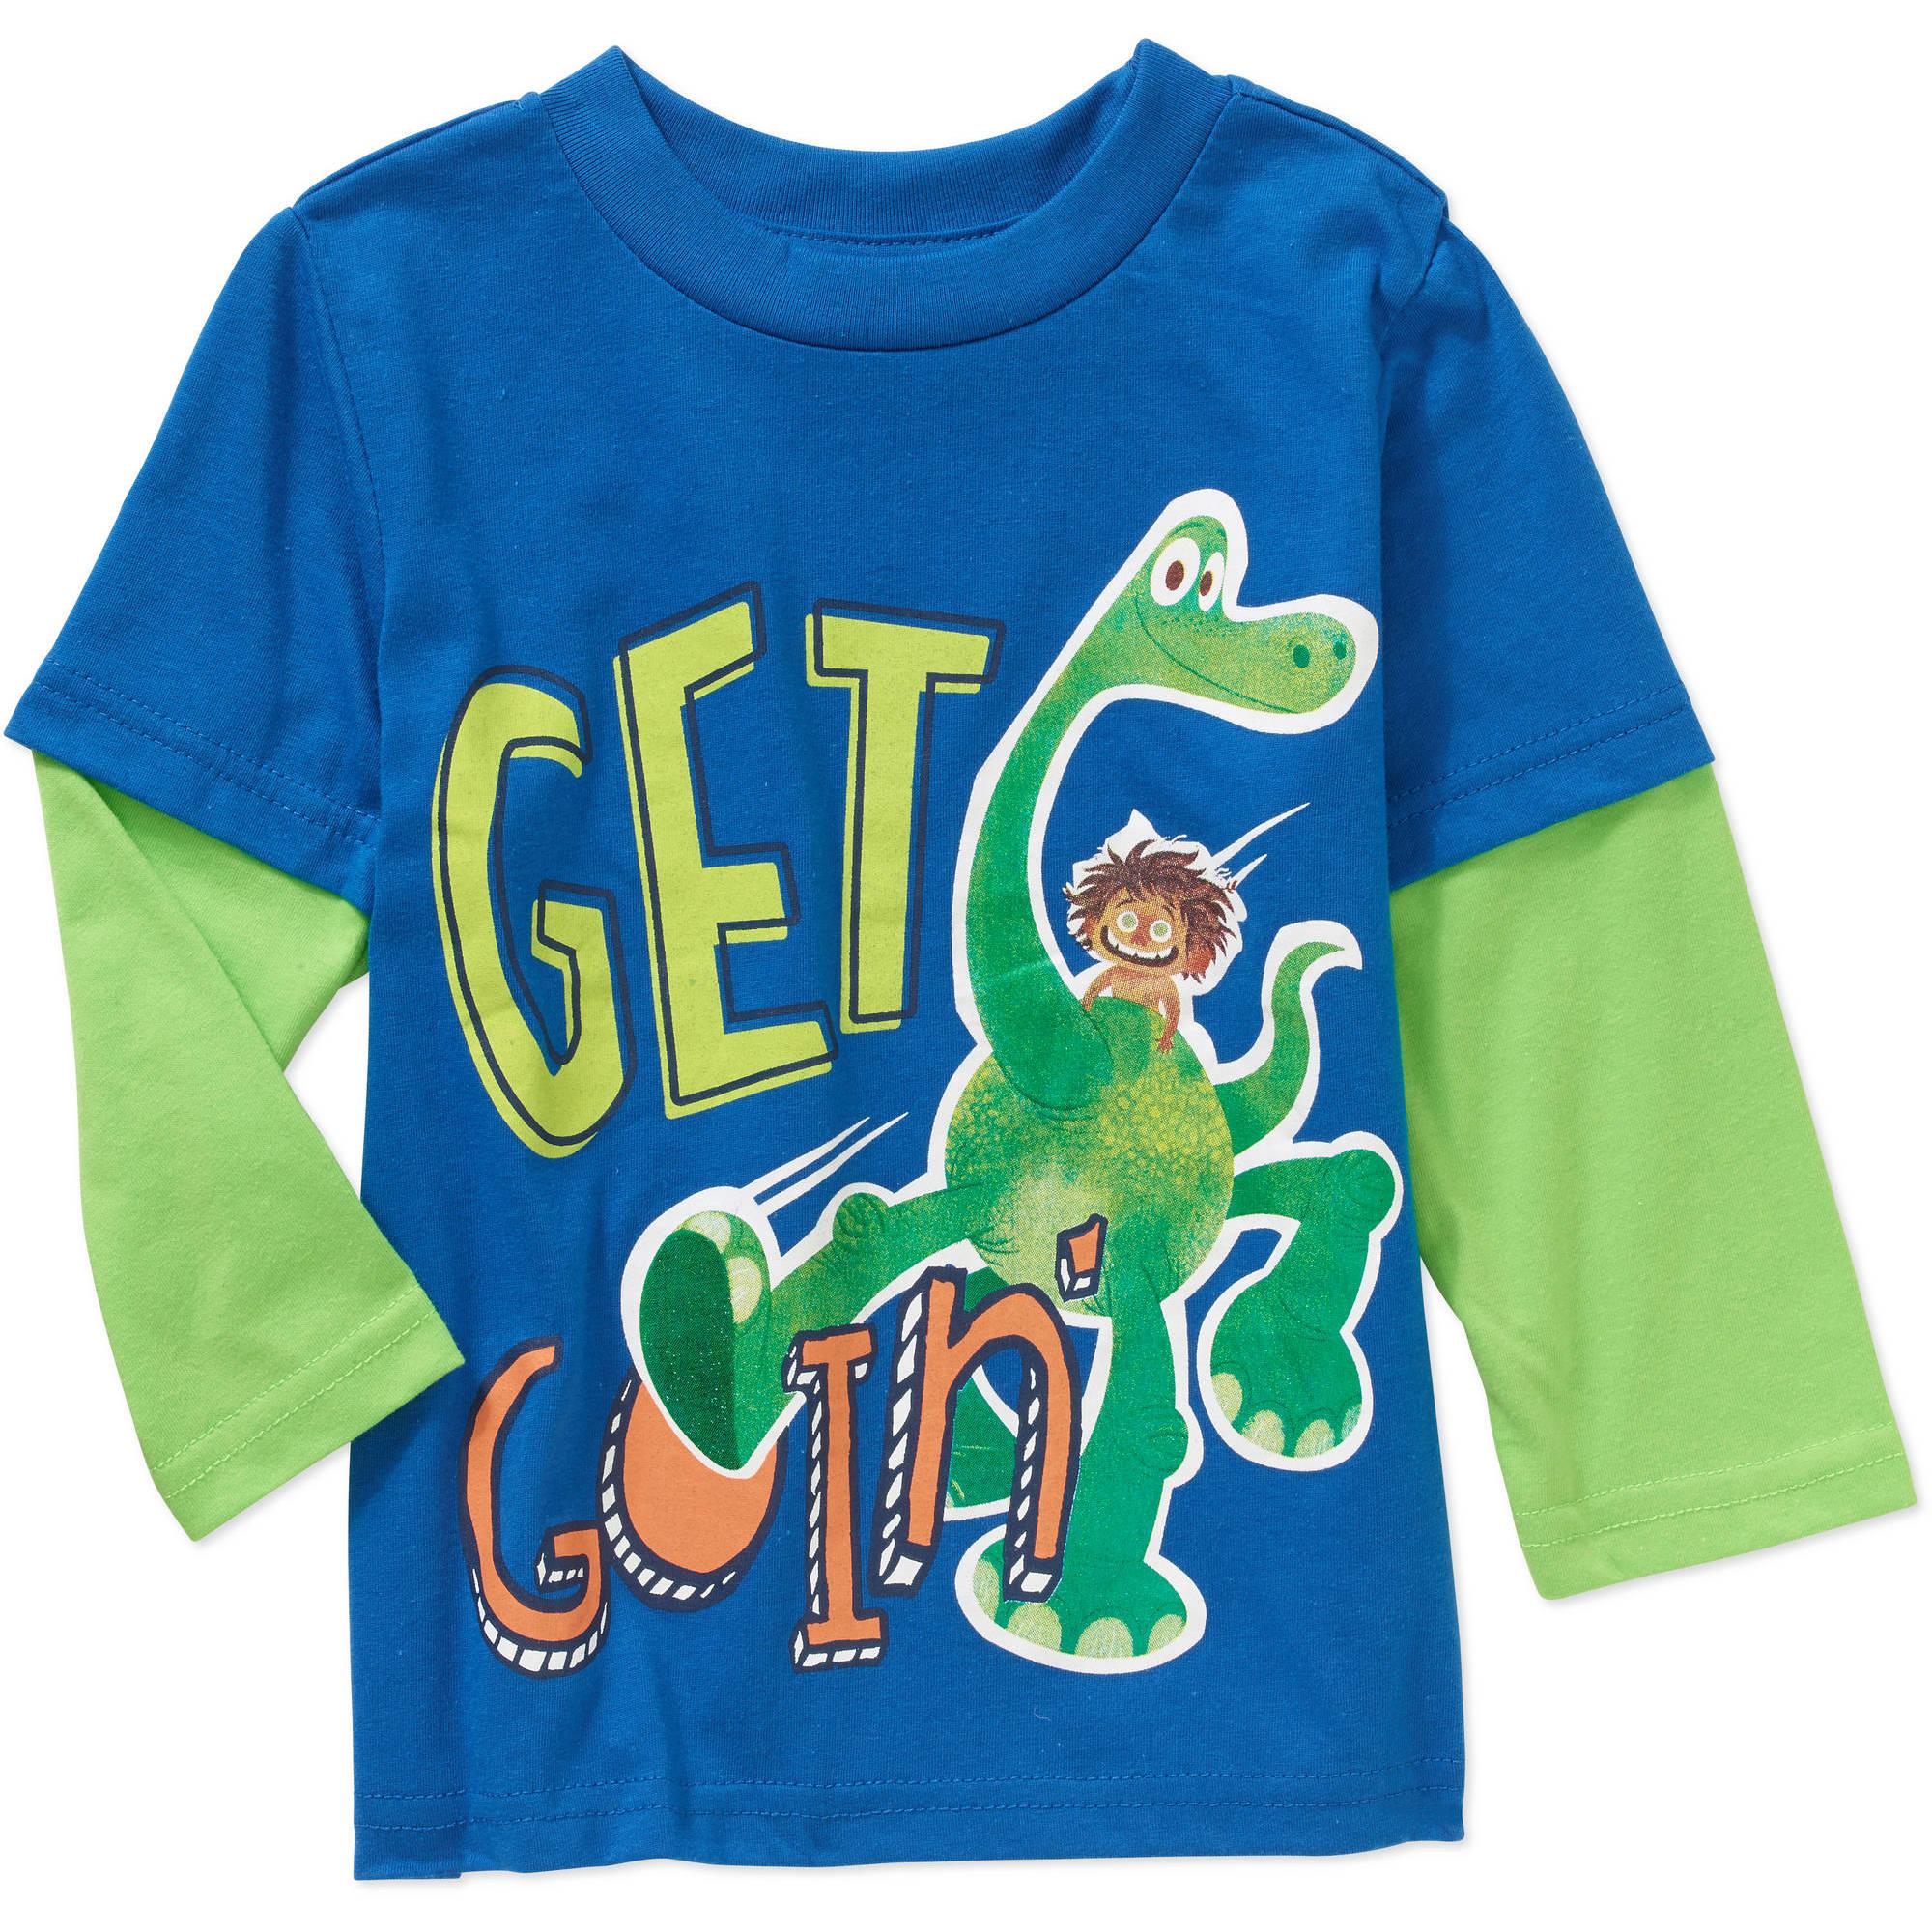 Disney The Good Dinosaur Toddler Boy 2Fer Long Sleeve Tee